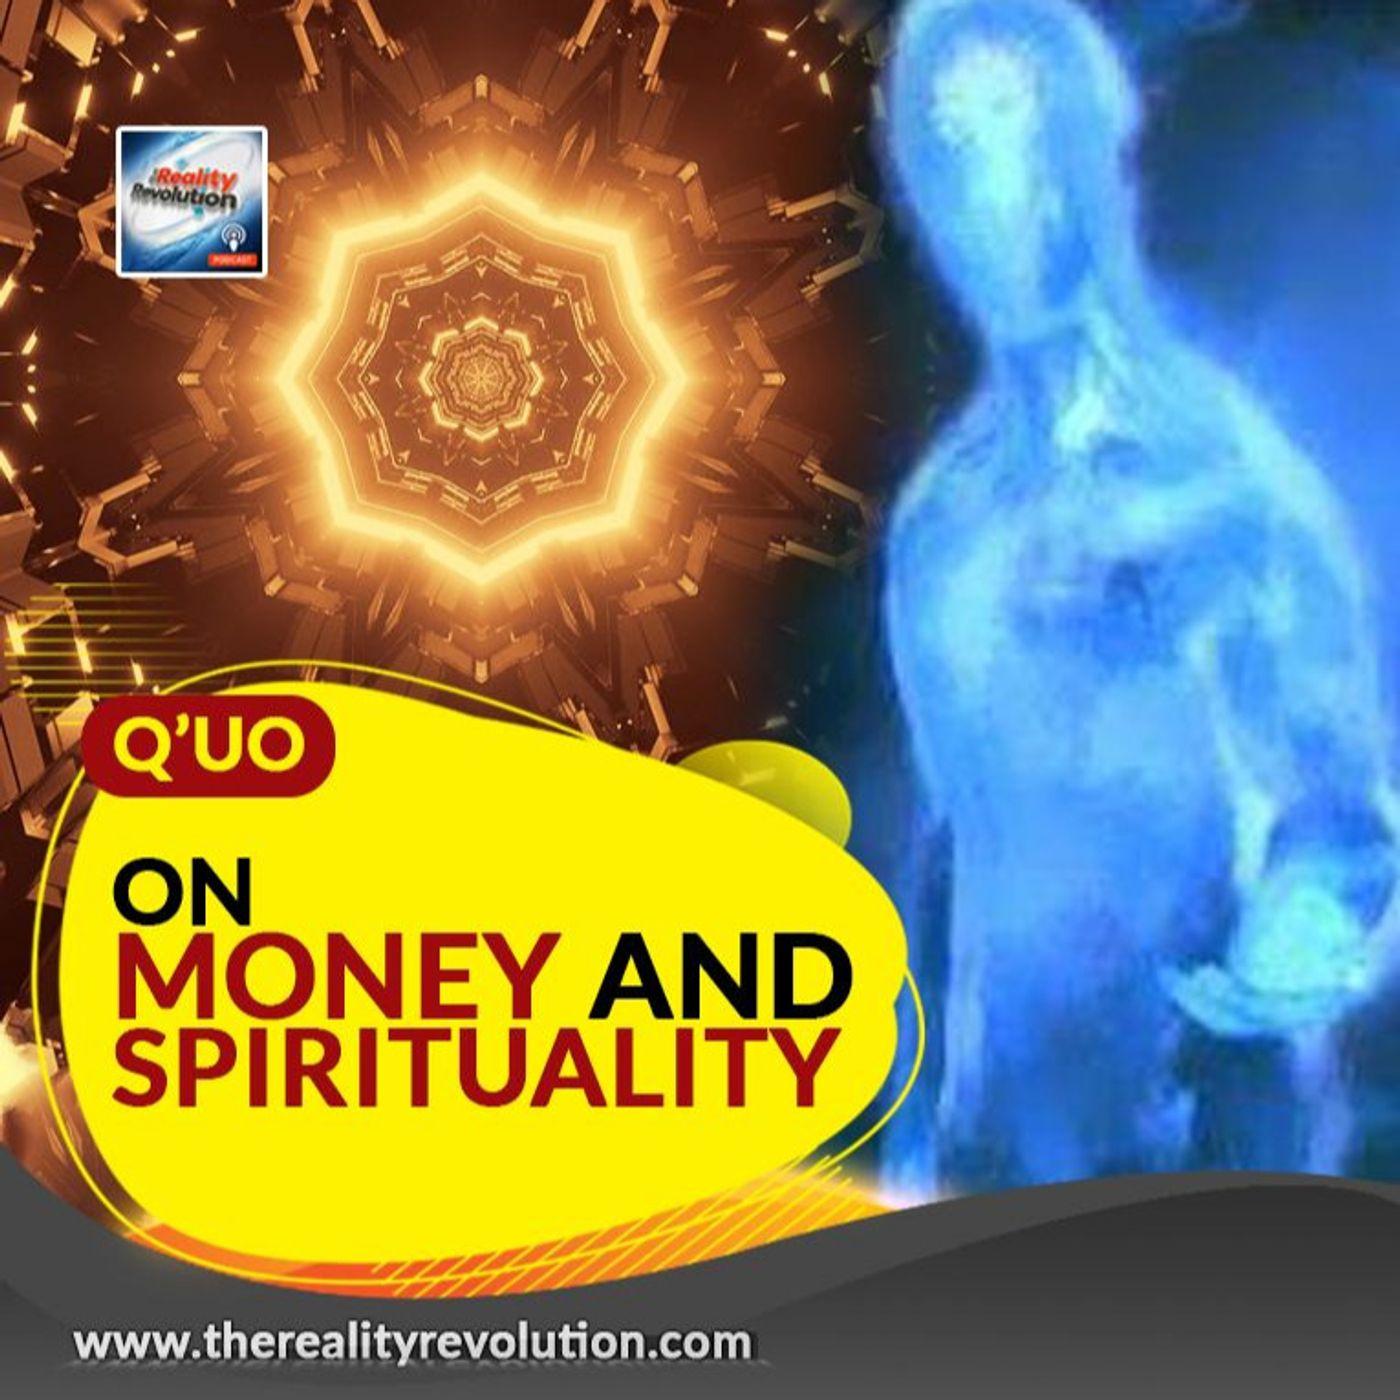 Q'uo - On Money And Spirituality